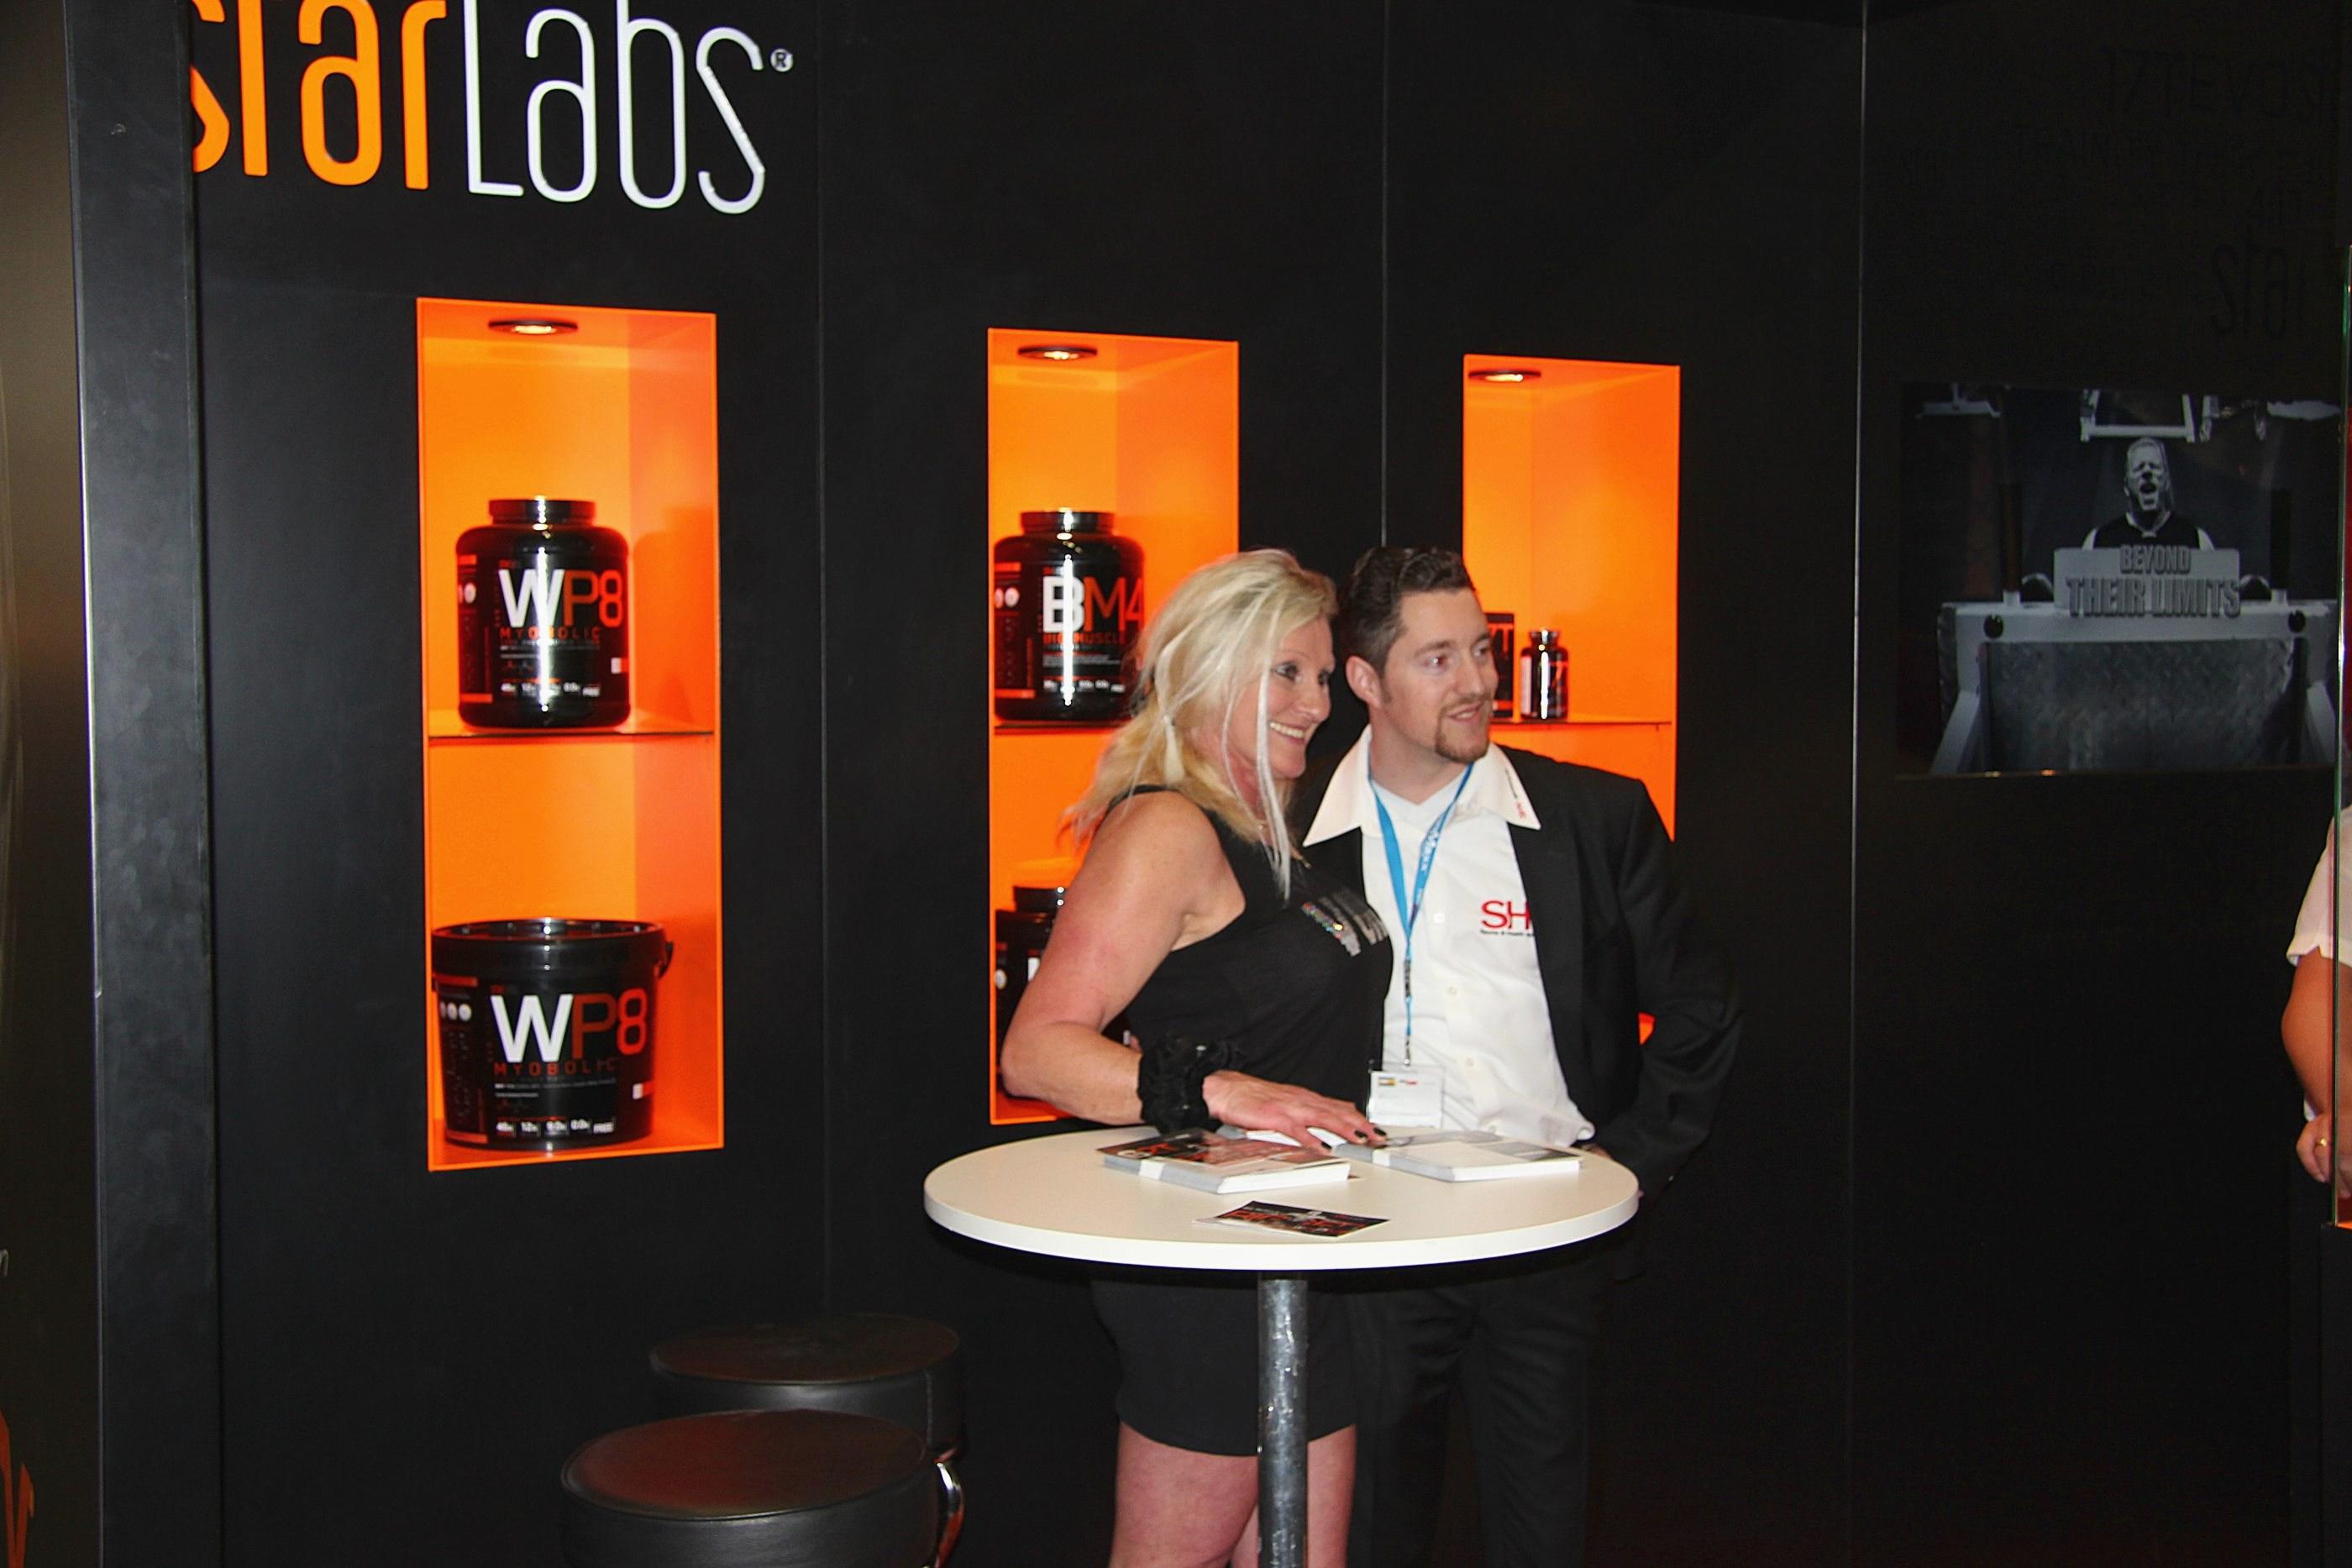 FIBO-2014-Star-Labs